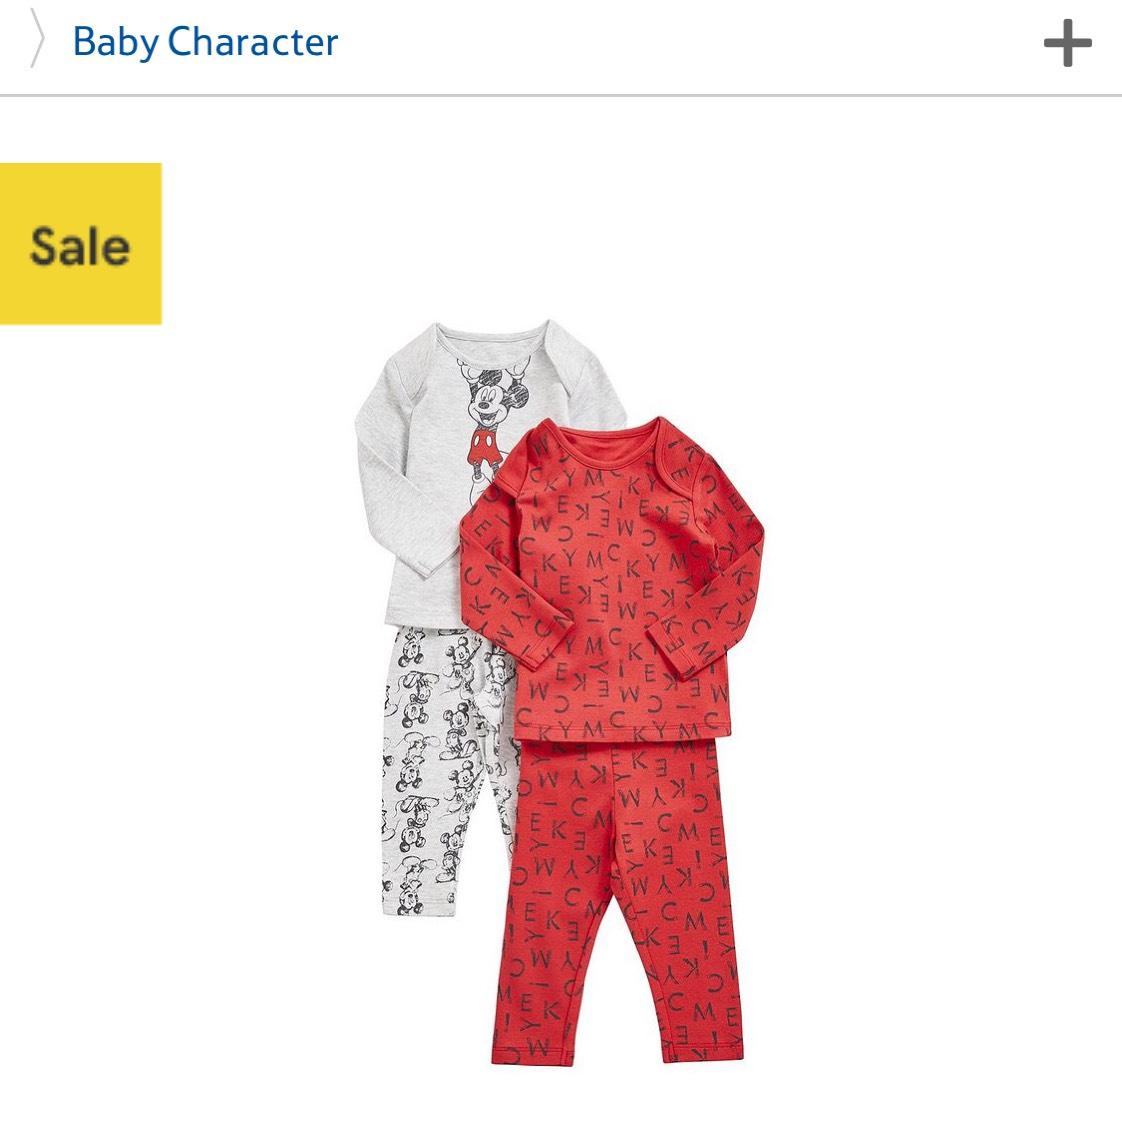 Disney 2 Pack of Mickey Mouse Pyjamas @ Tesco £4.00 was £7.50